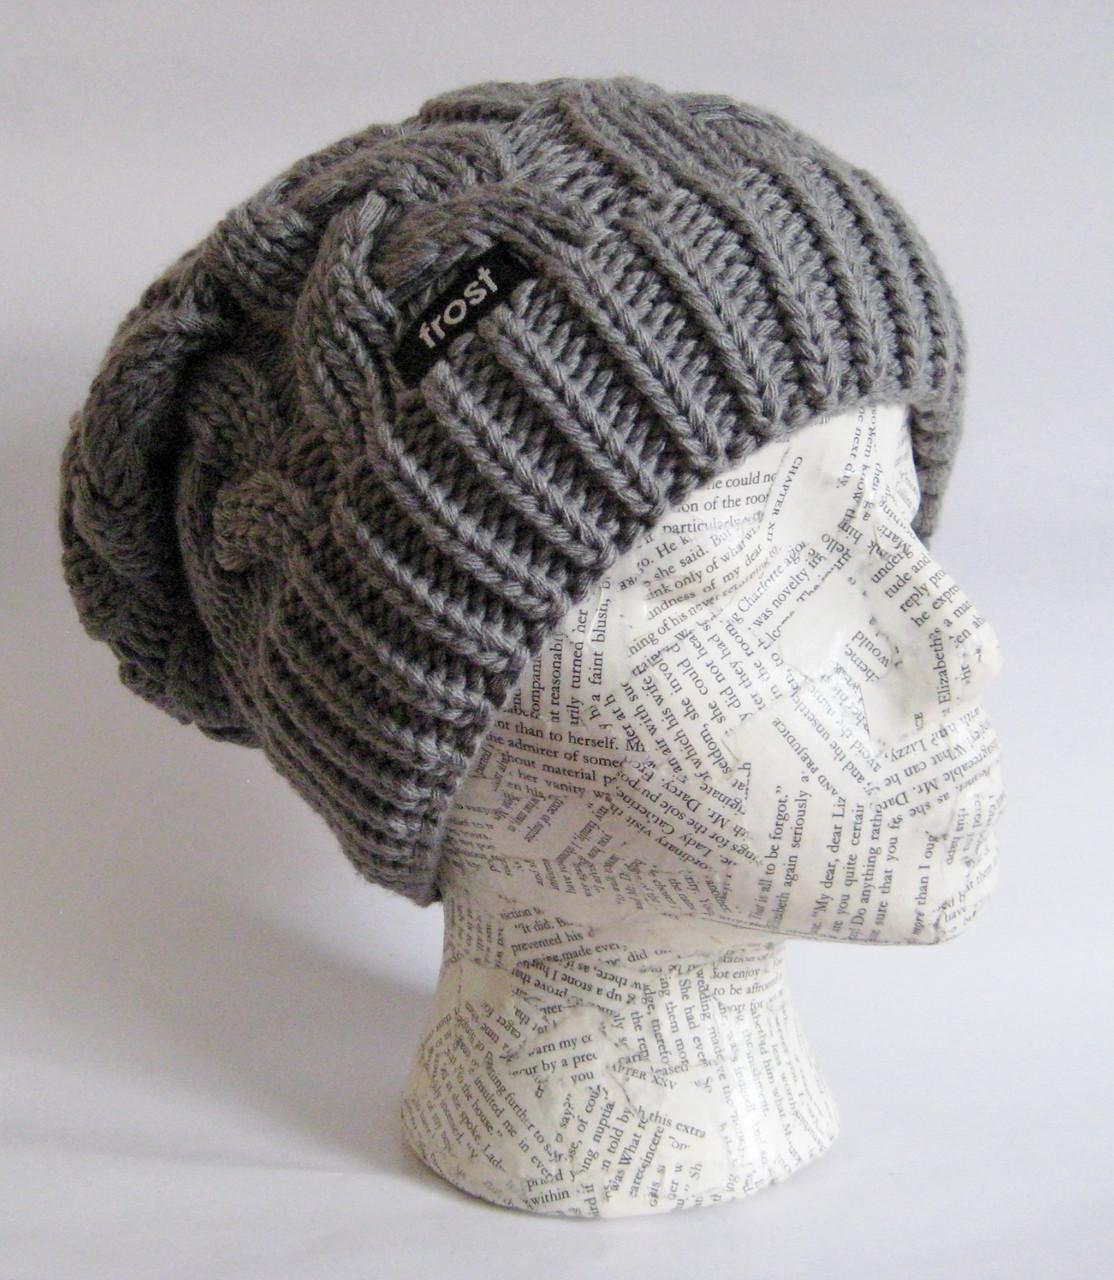 ba1244d0f9bb77 Woman's Slouchy Beanie| Slouchy Winter Hat| Winter Knit Hat